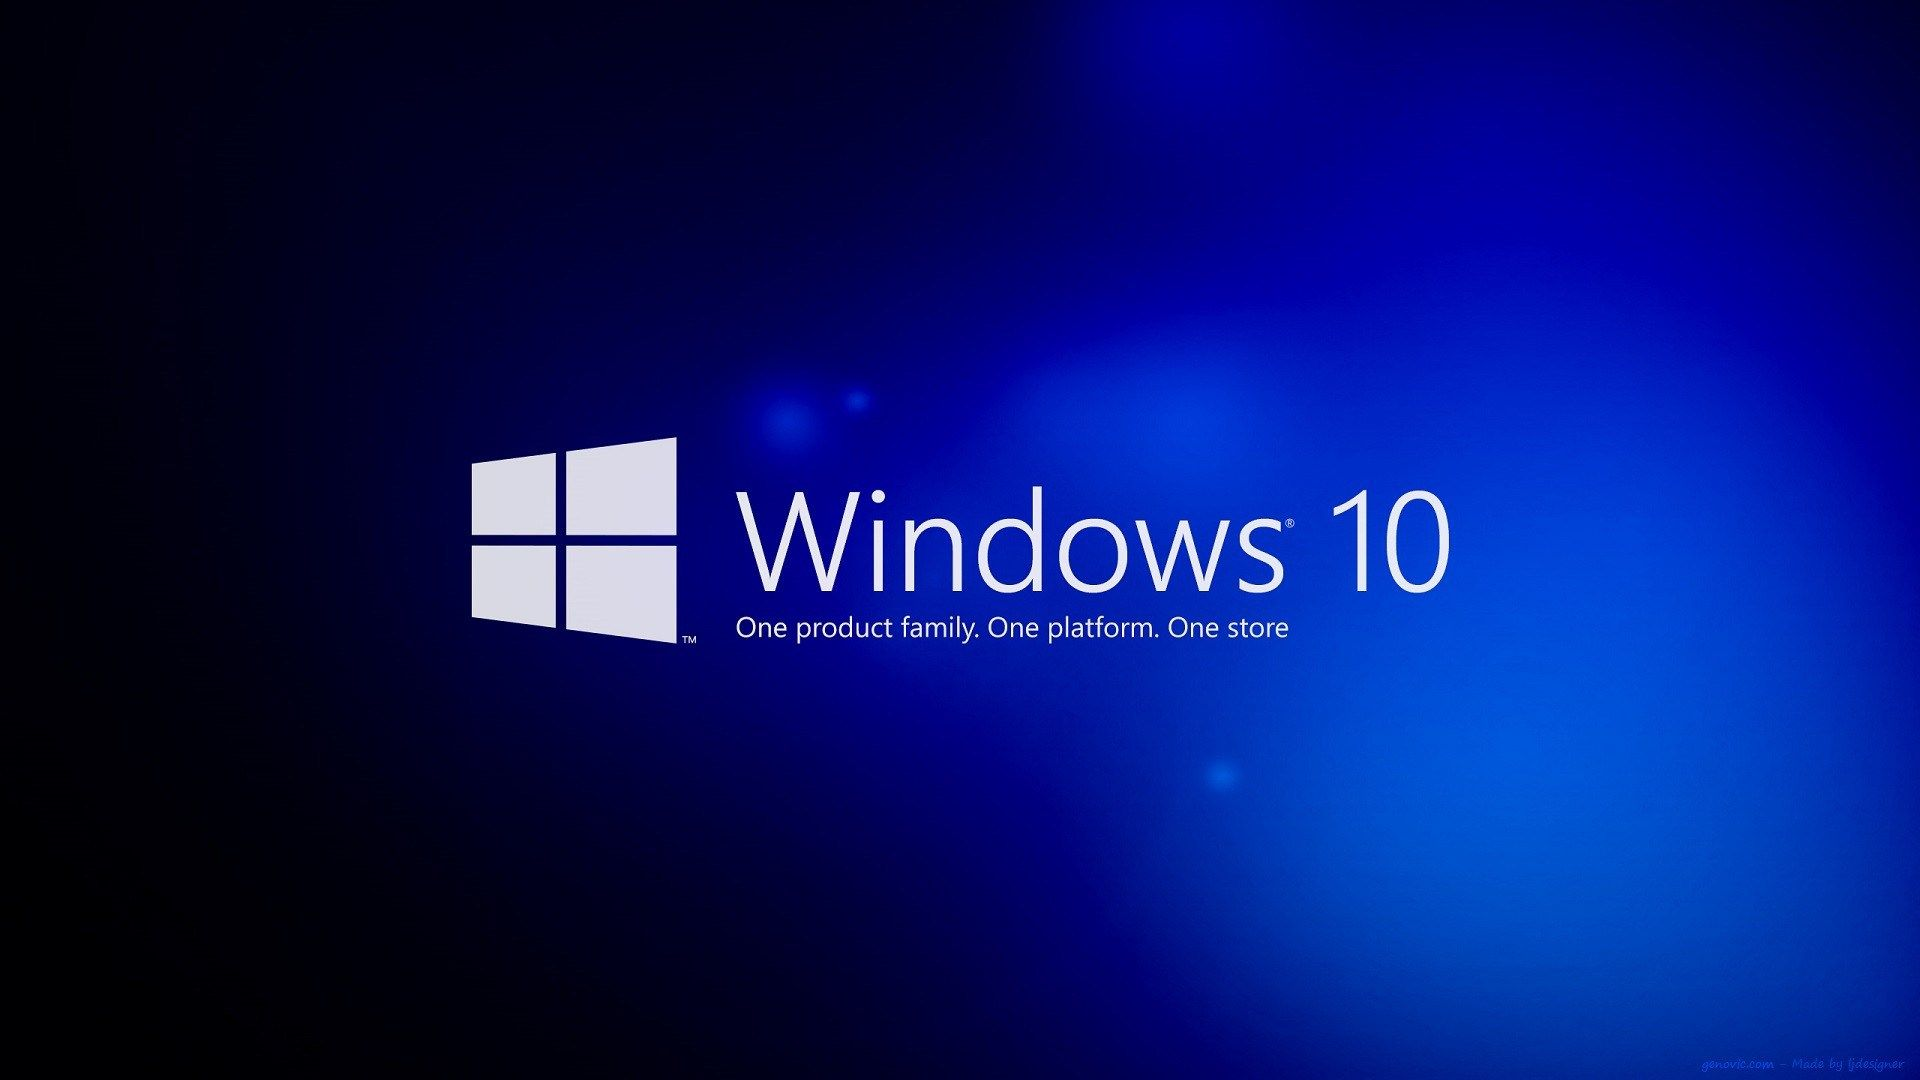 Best Hd Wallpaper For Windows 10